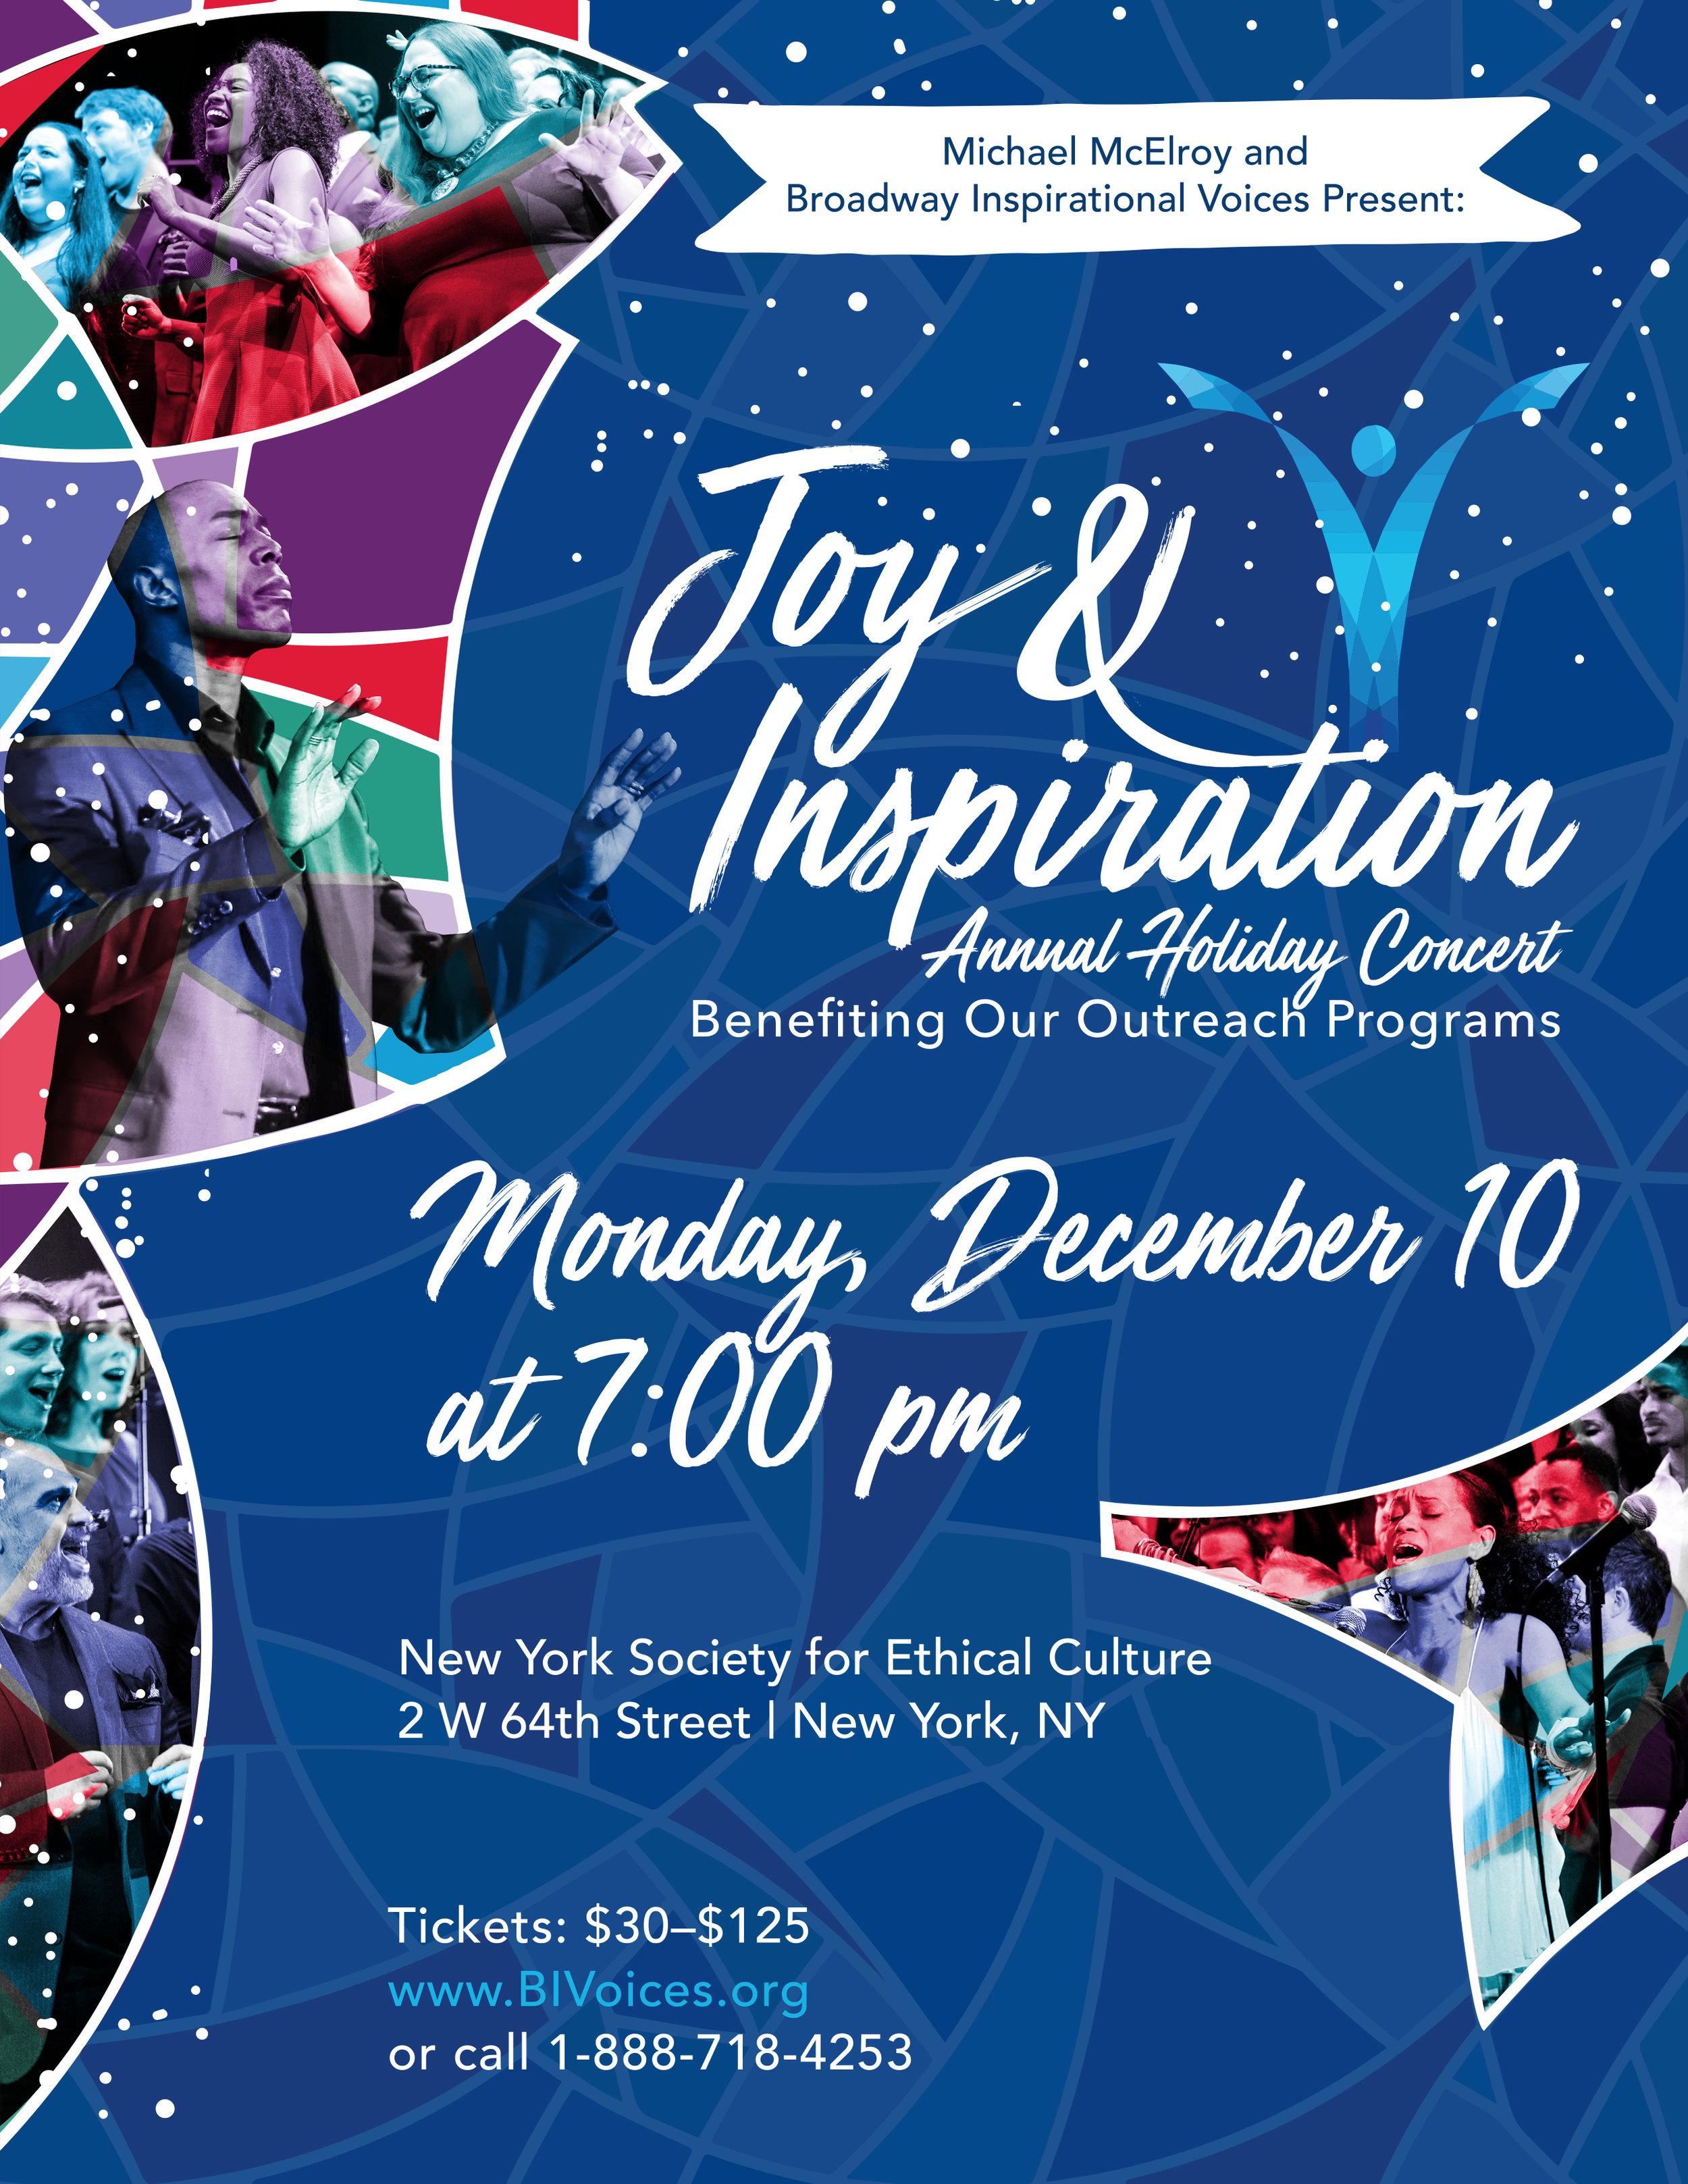 Joy and inspiration Flier 2018.jpg